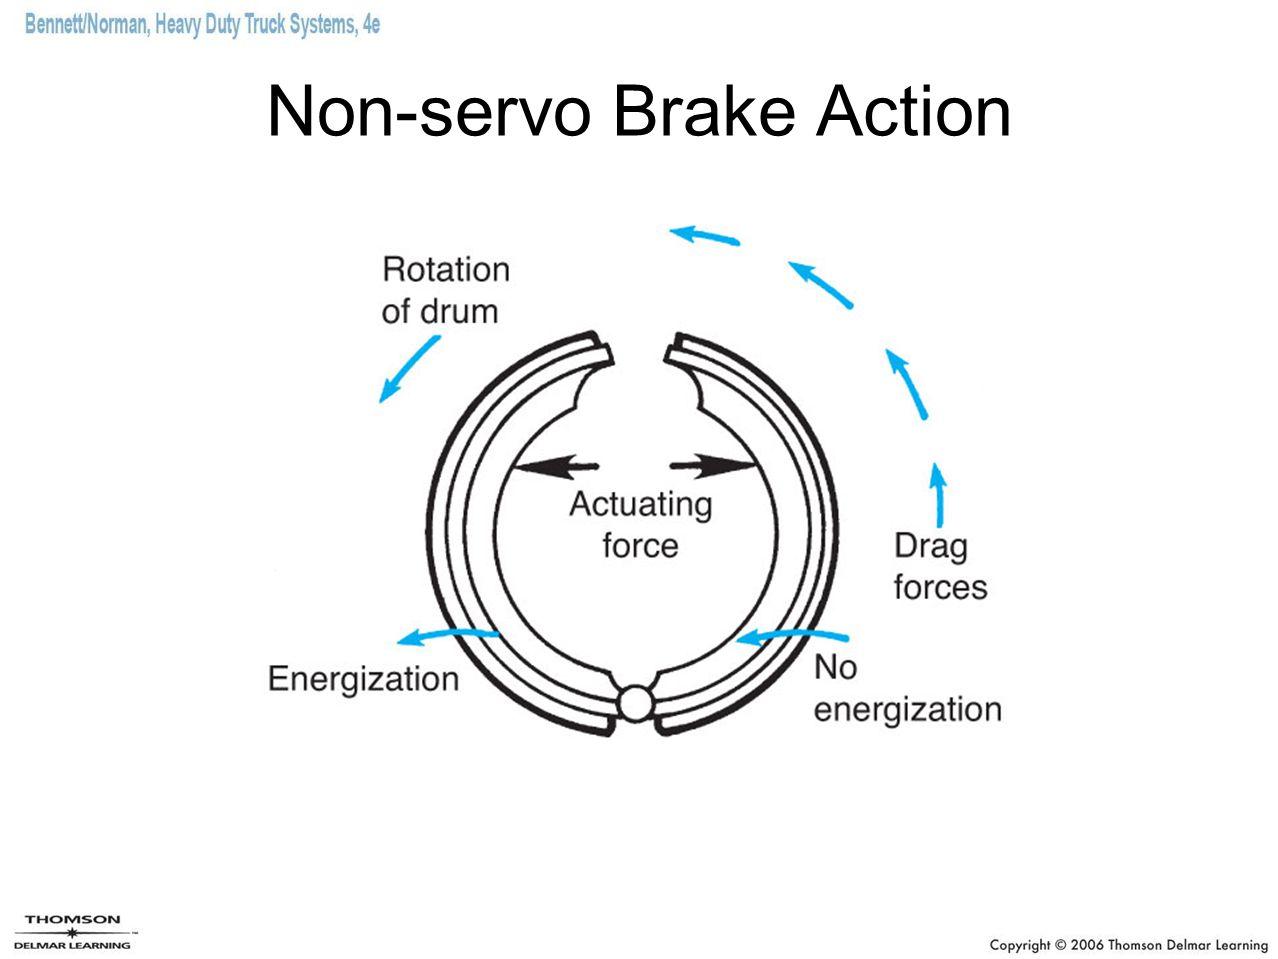 Non-servo Brake Action